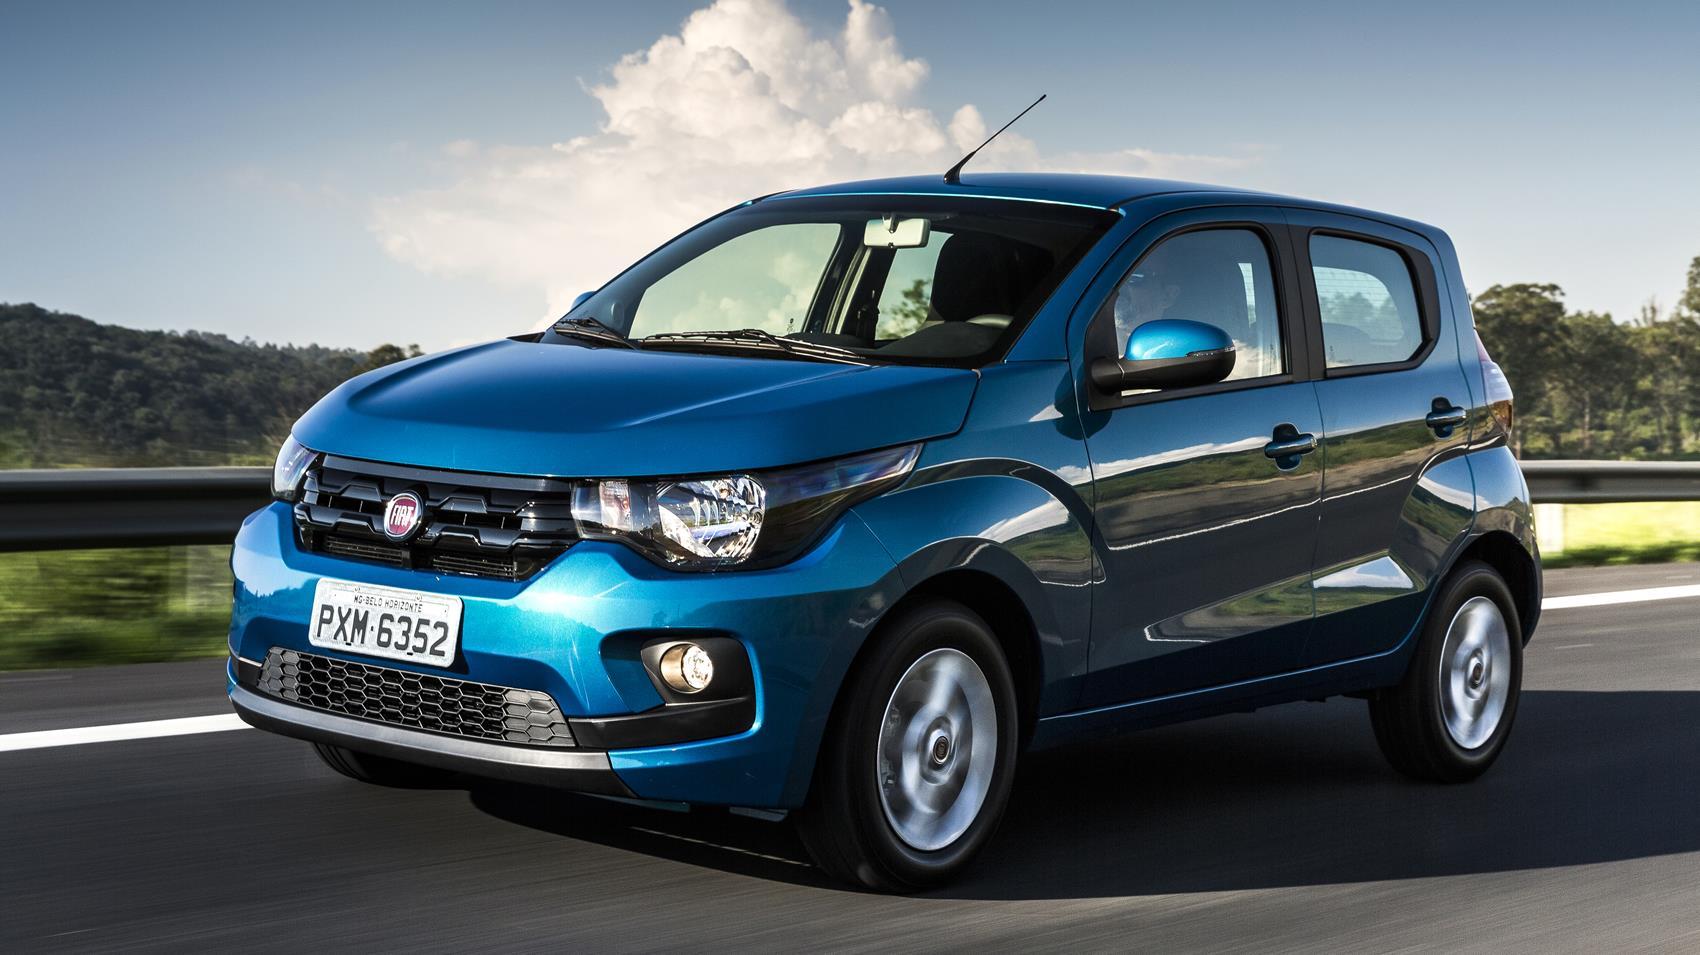 Fiat Mobi 2017 easy like way on (1)